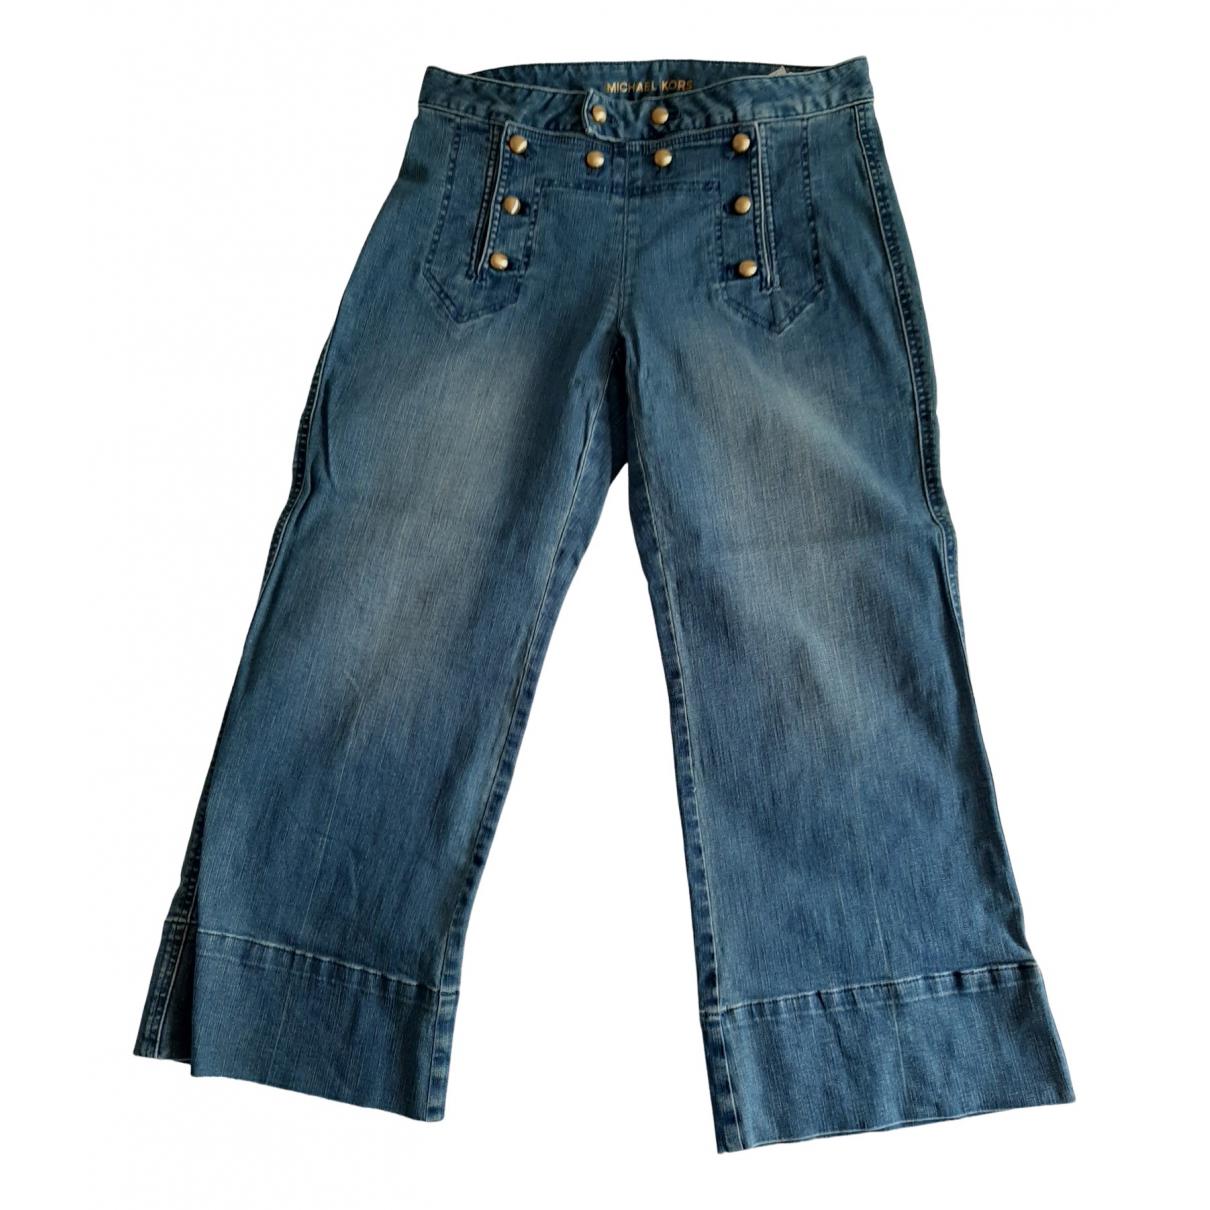 Michael Kors N Blue Cotton - elasthane Jeans for Women 28 US